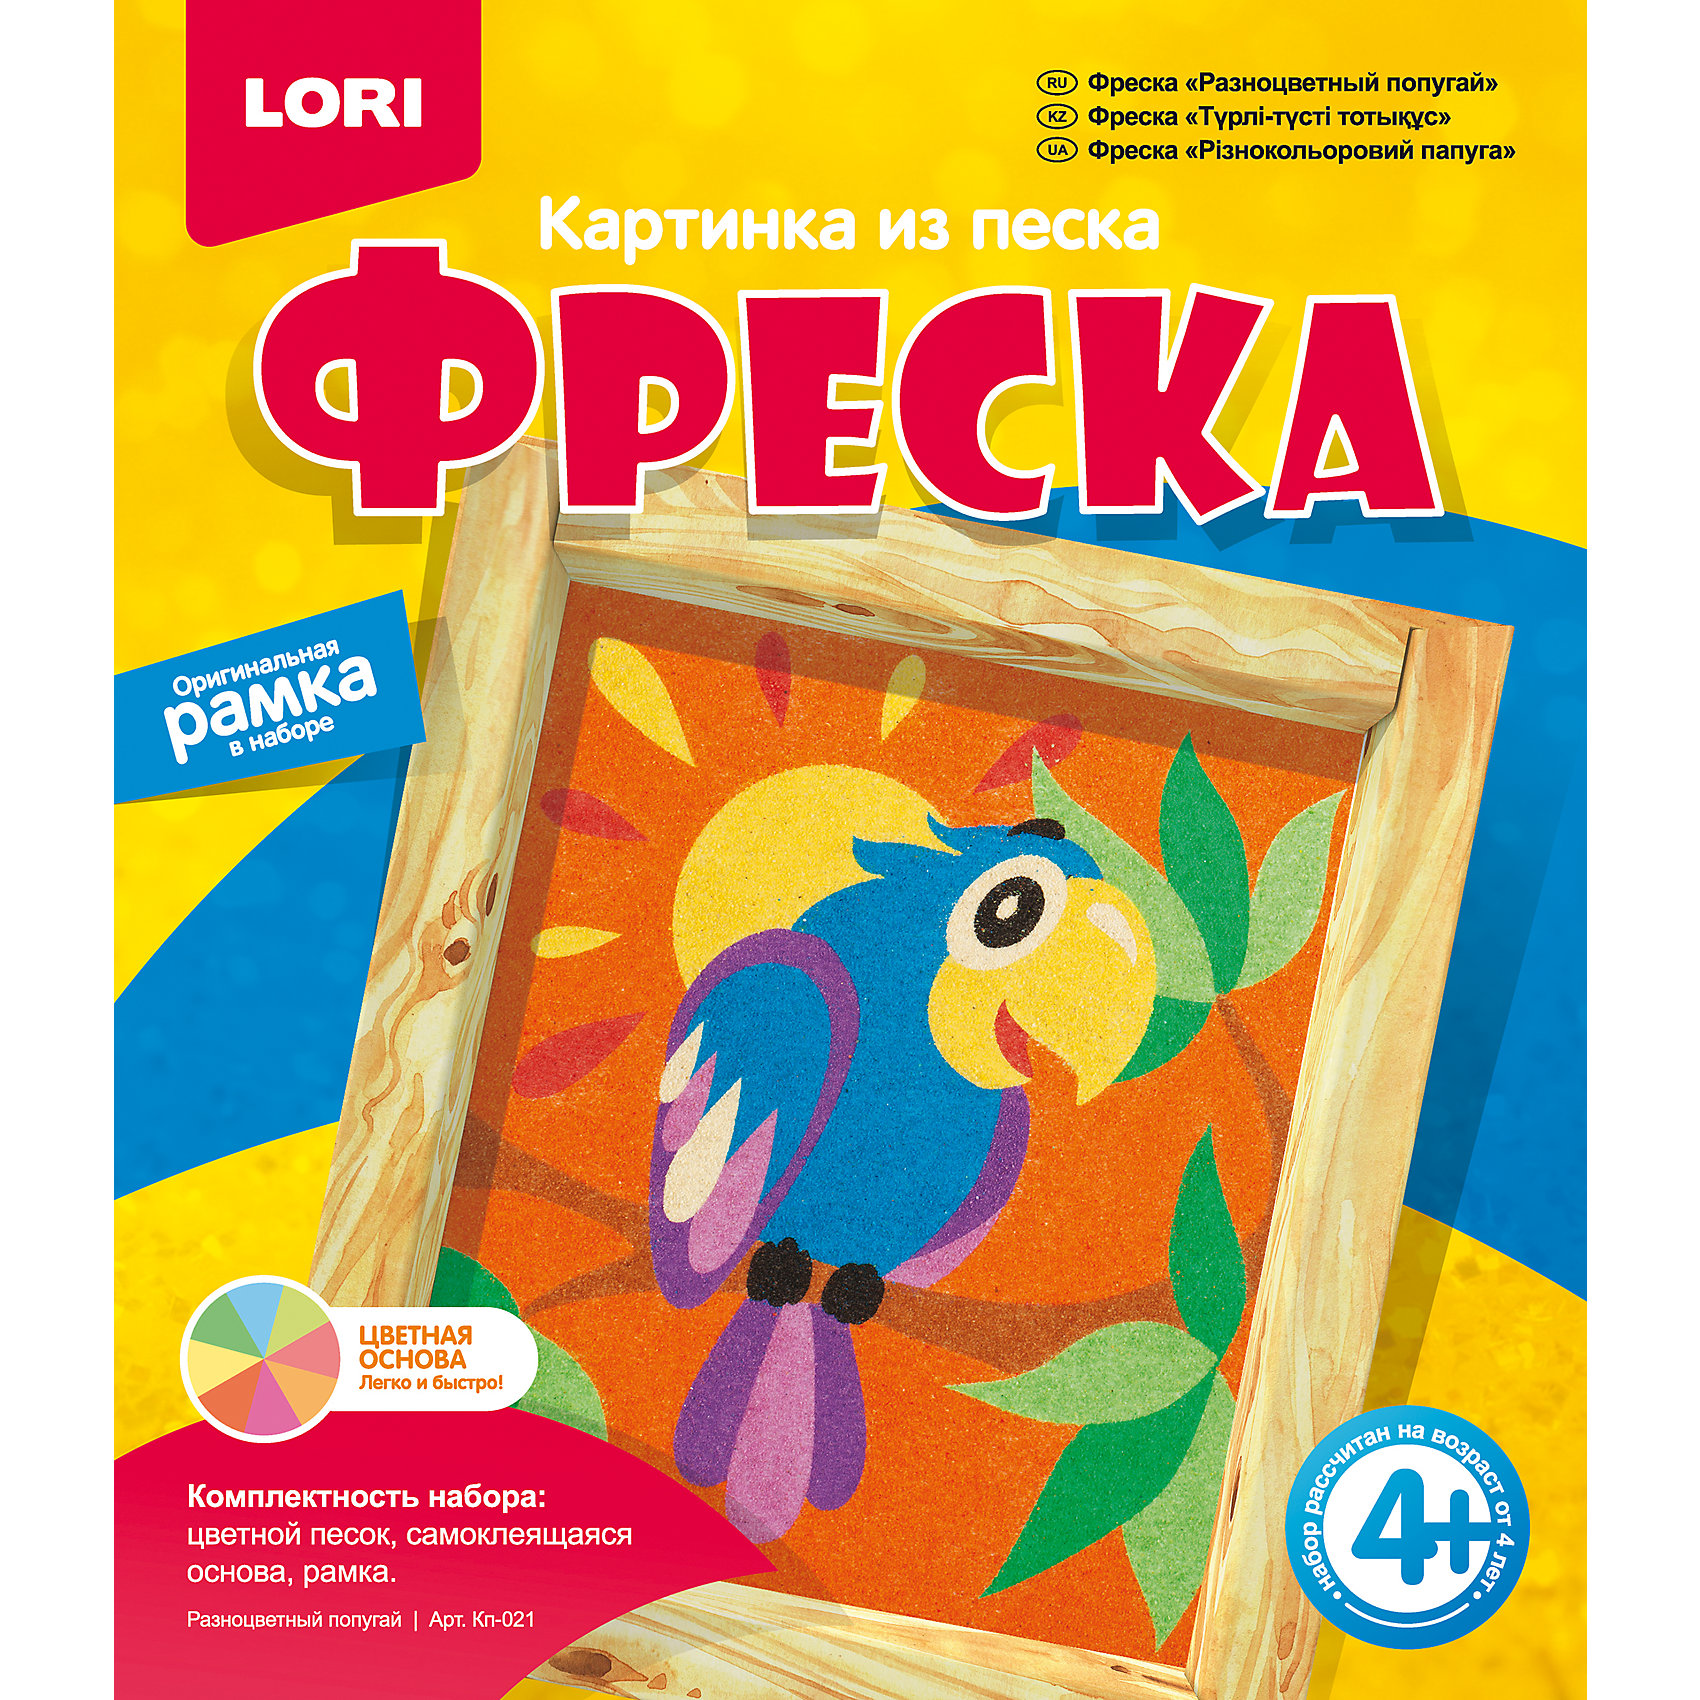 LORI Фреска, Картина из песка Разноцветный попугай lori фоторамки из гипса на клумбе